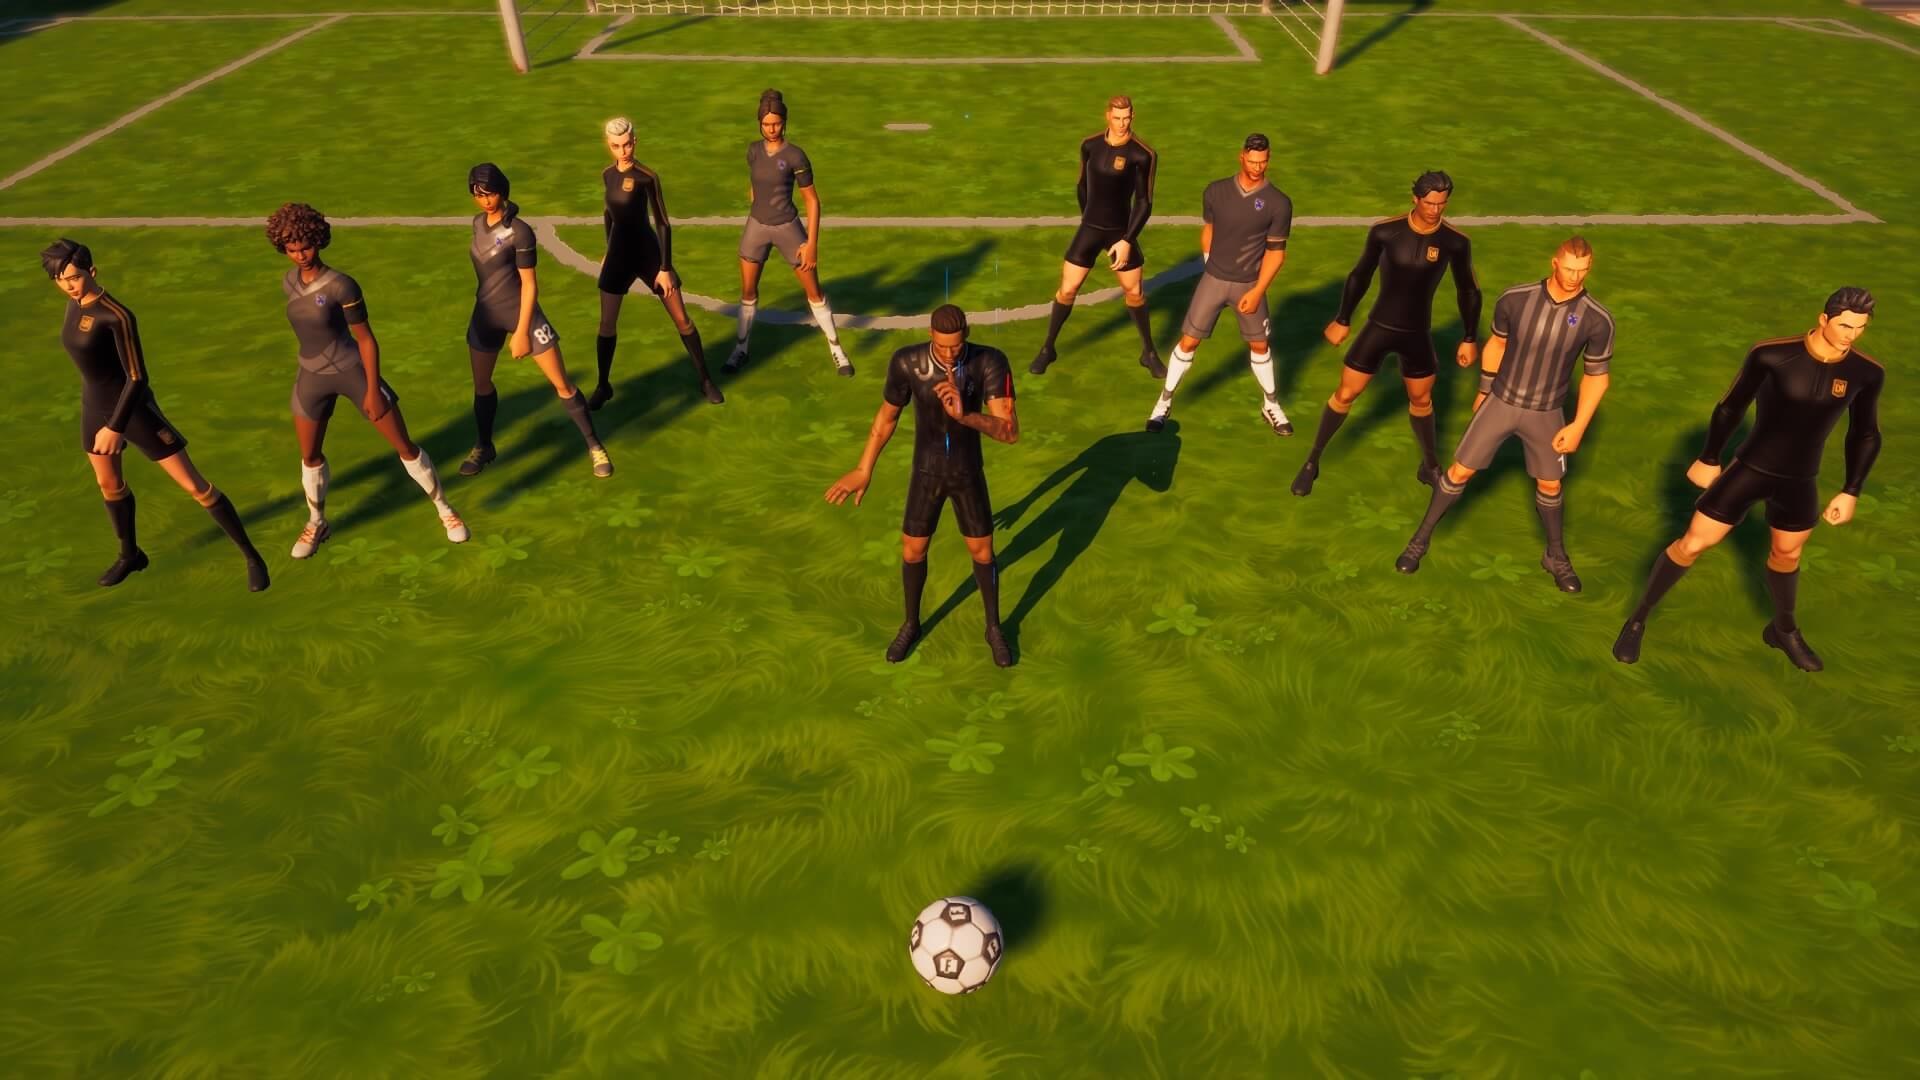 _Levia_R_MSSP Soccer Fortography